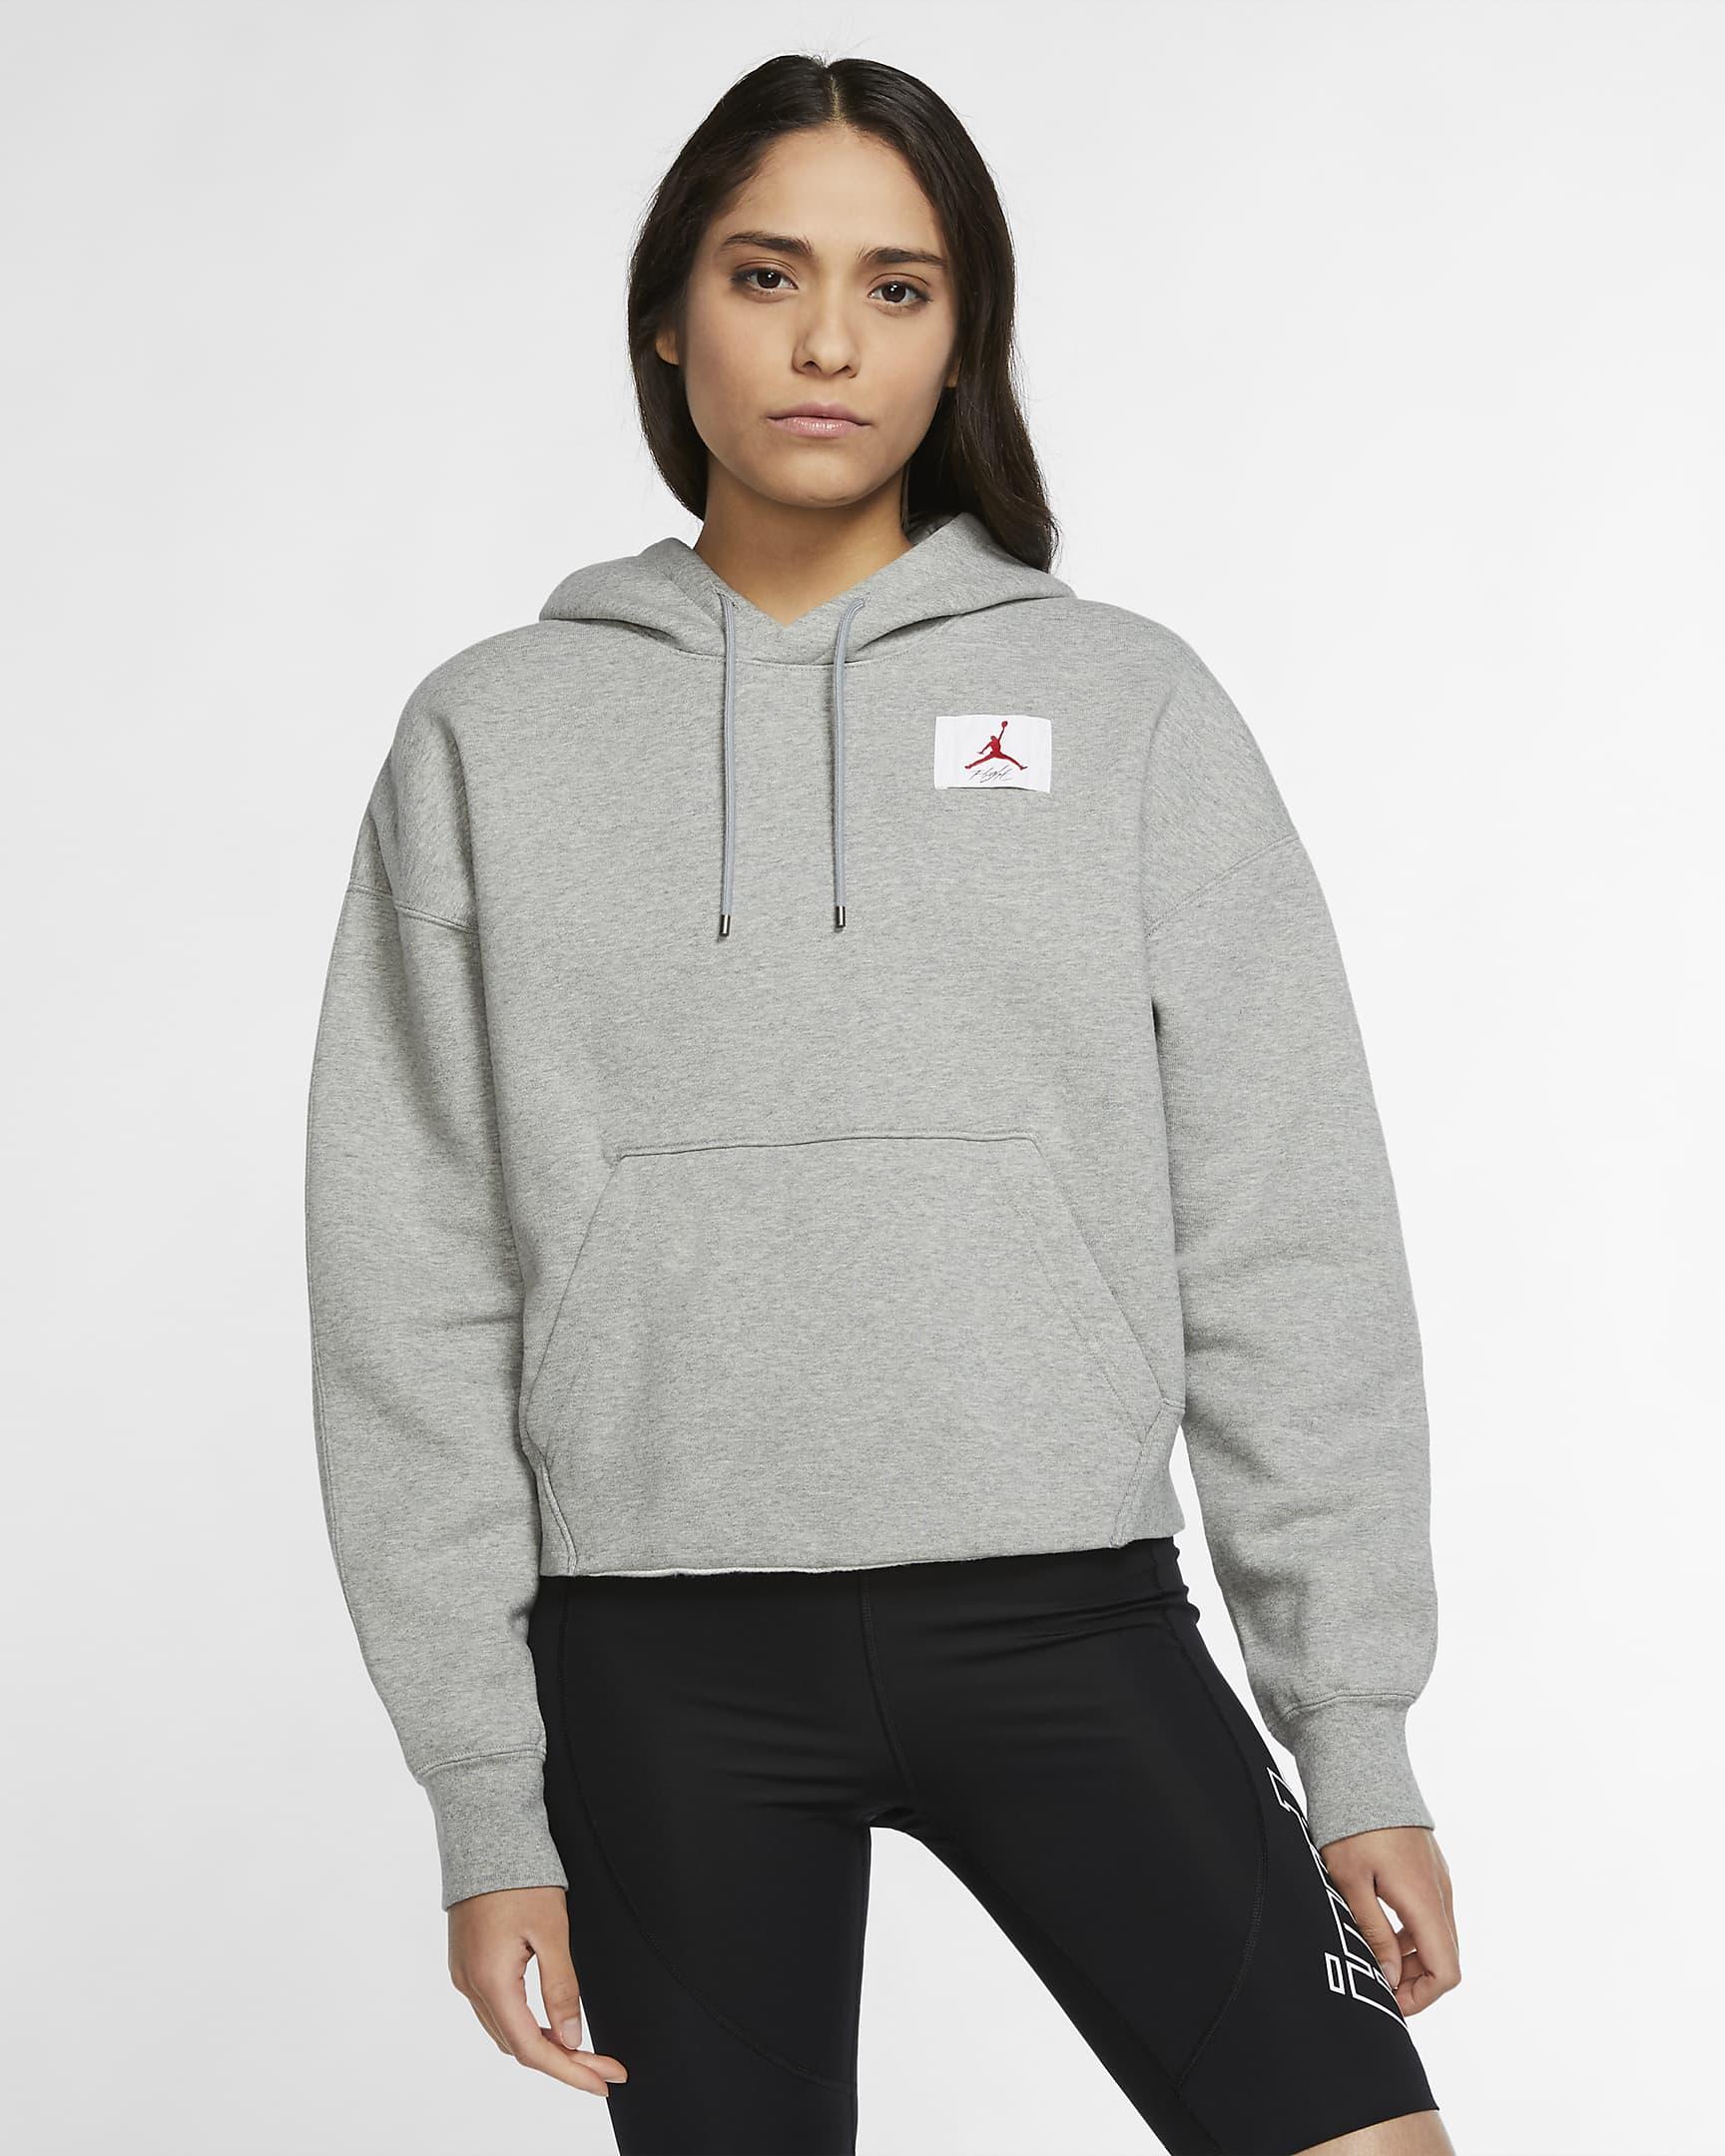 jordan-flight-womens-fleece-pullover-hoodie-M8SP84-2